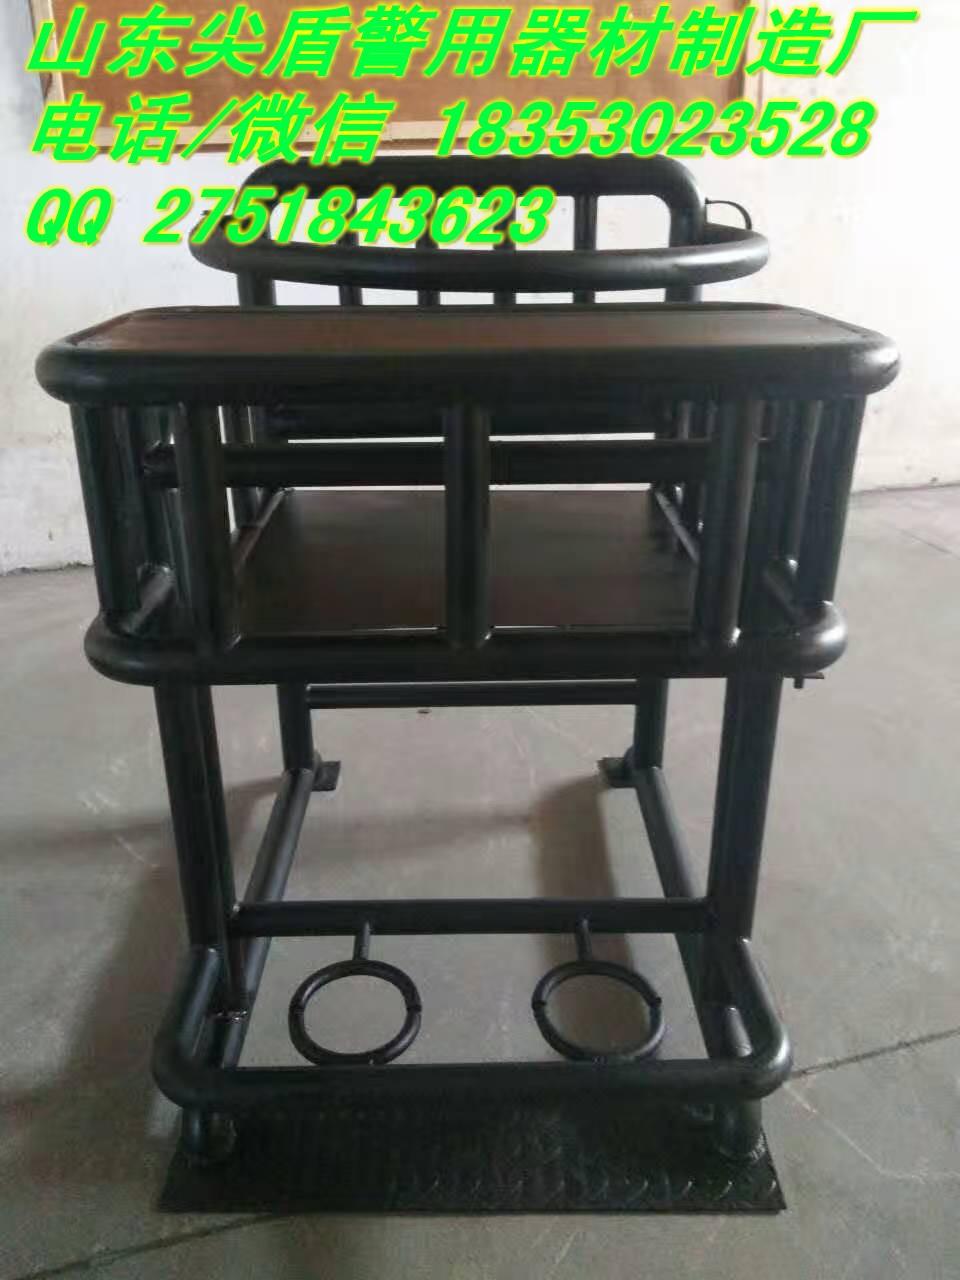 JDYC 优质钢审讯椅/普通钢审讯椅